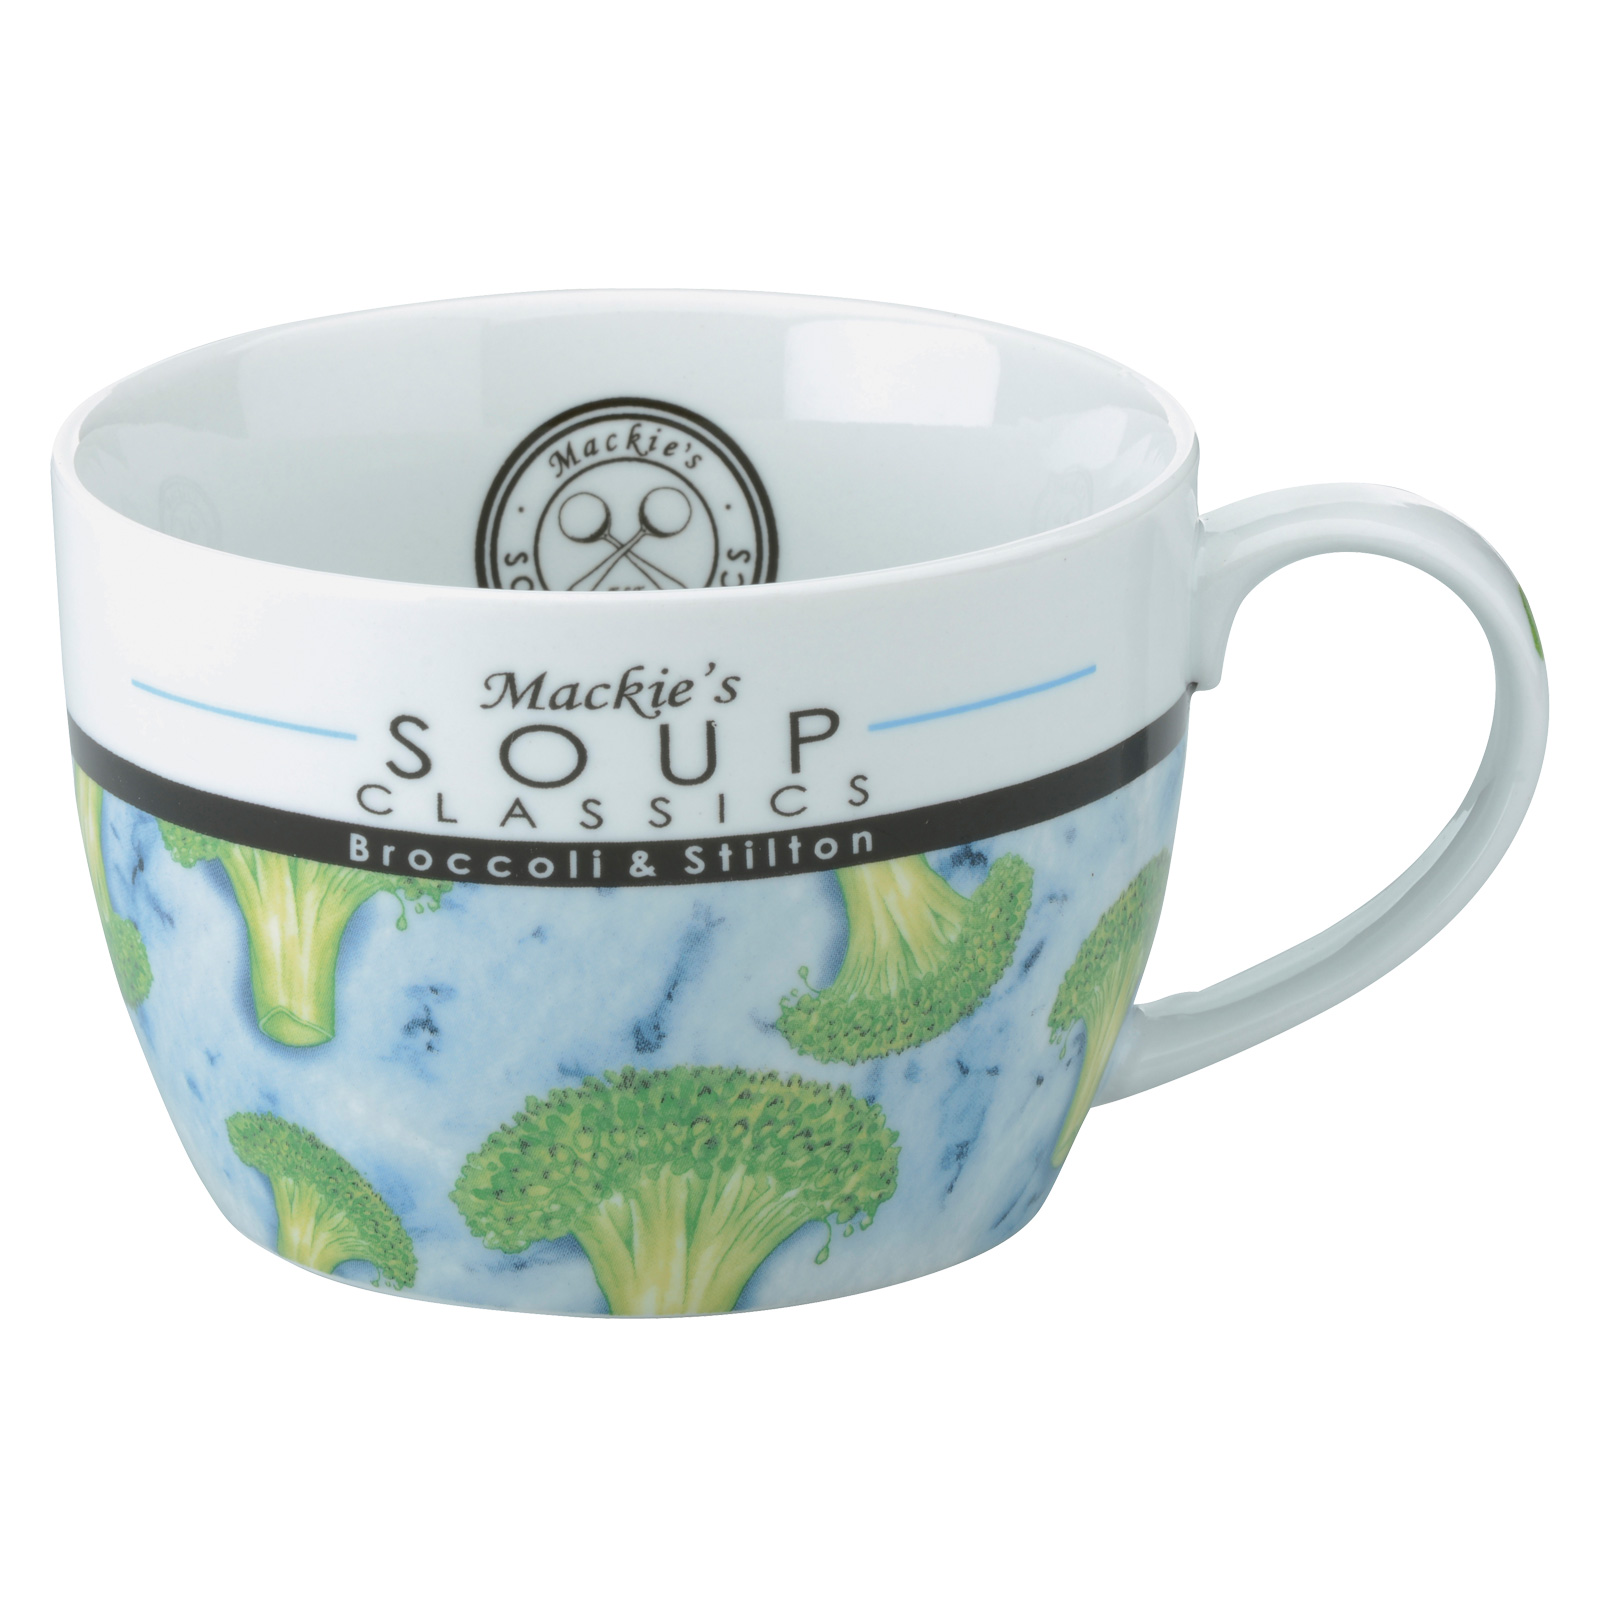 Mackie's Broccoli & Stilton Soup Mug by BIA